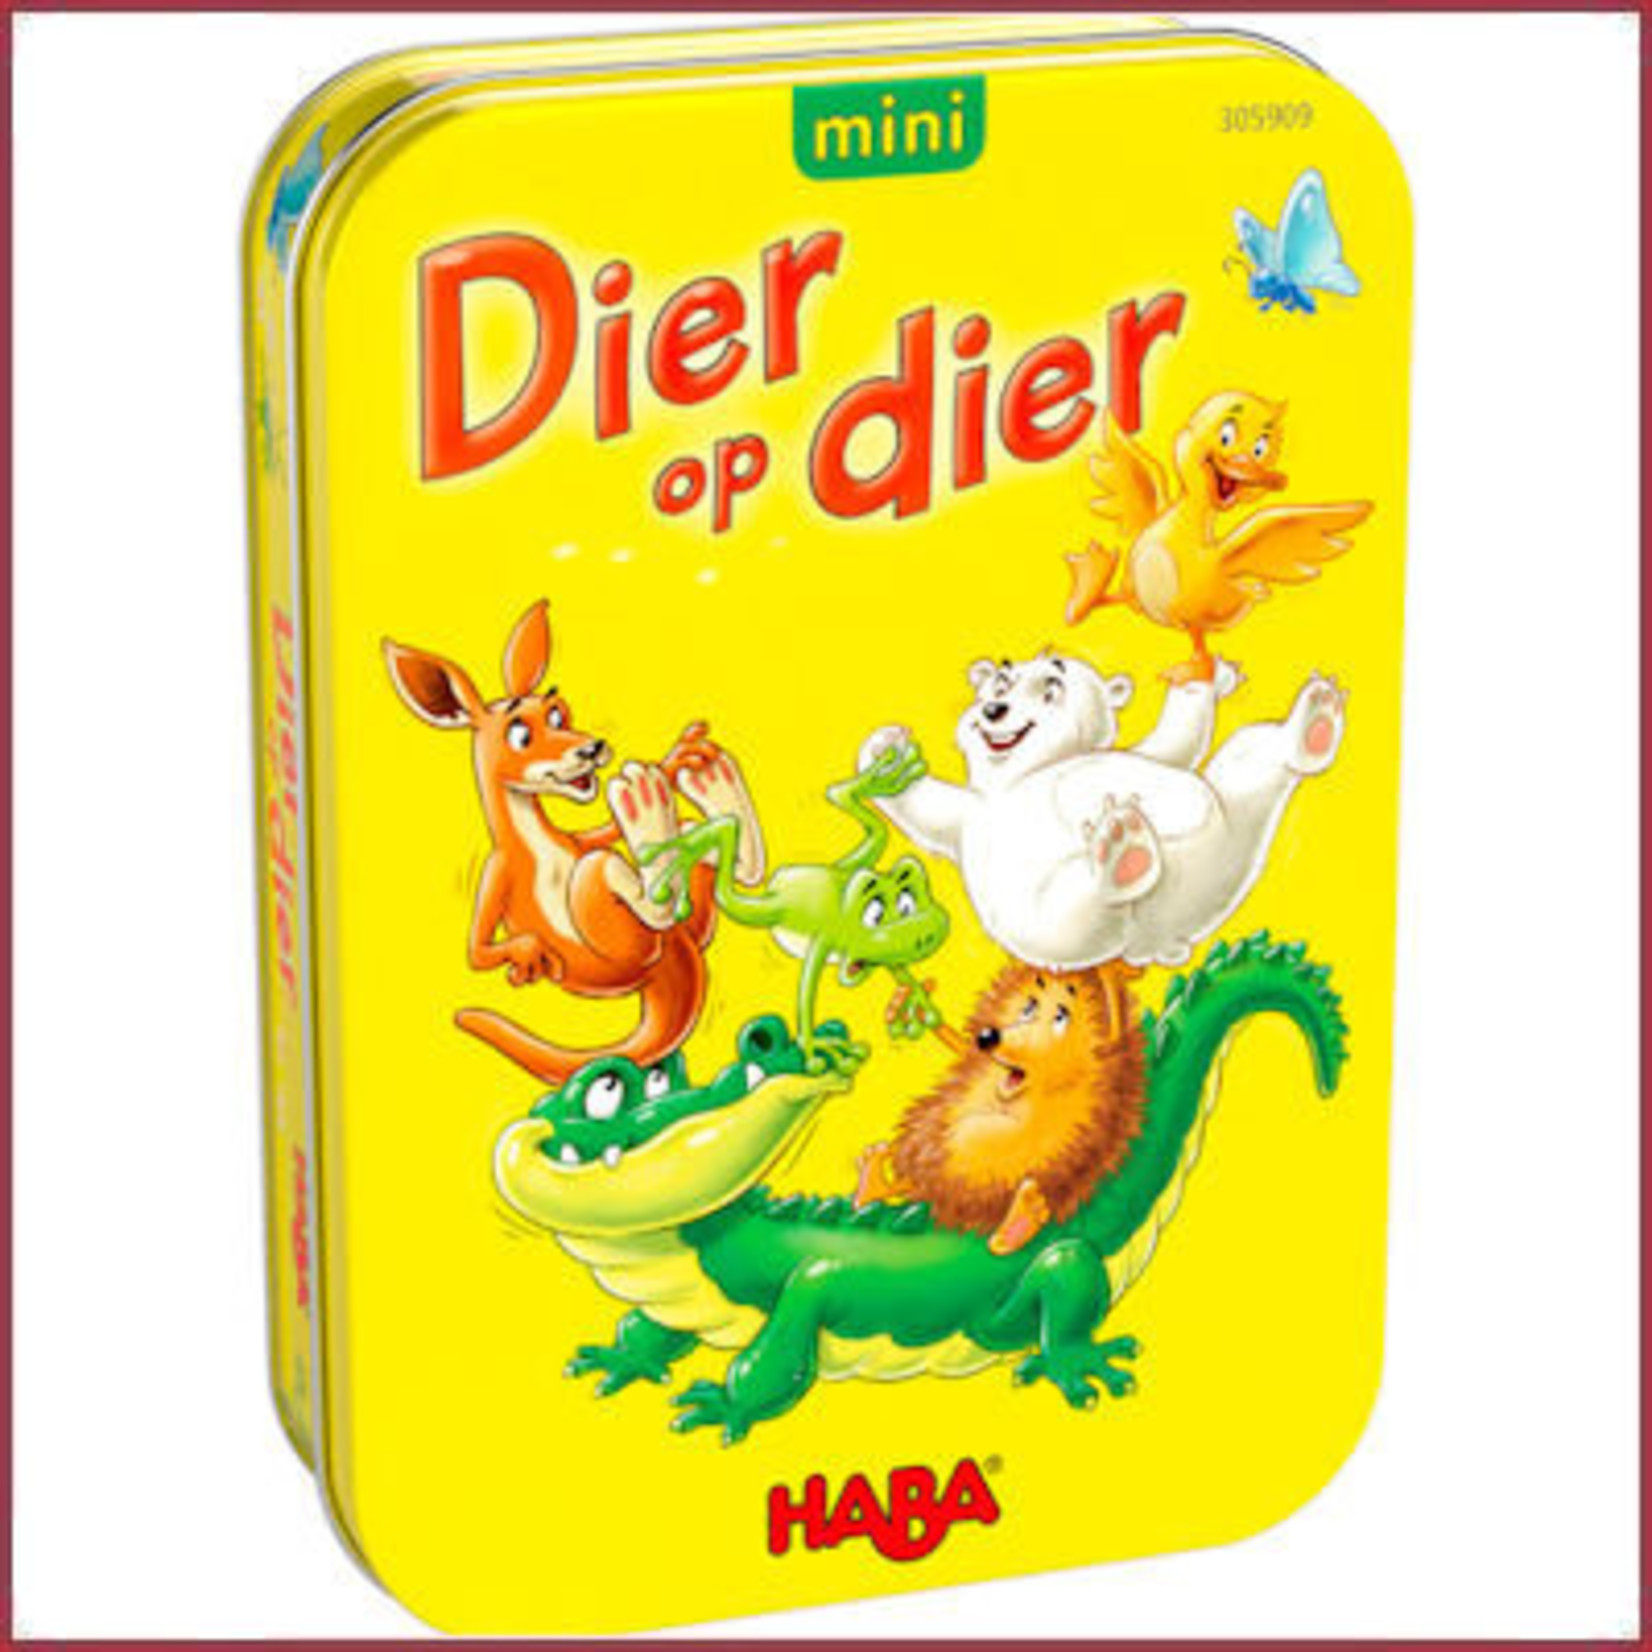 Haba Spel - Dier op Dier mini